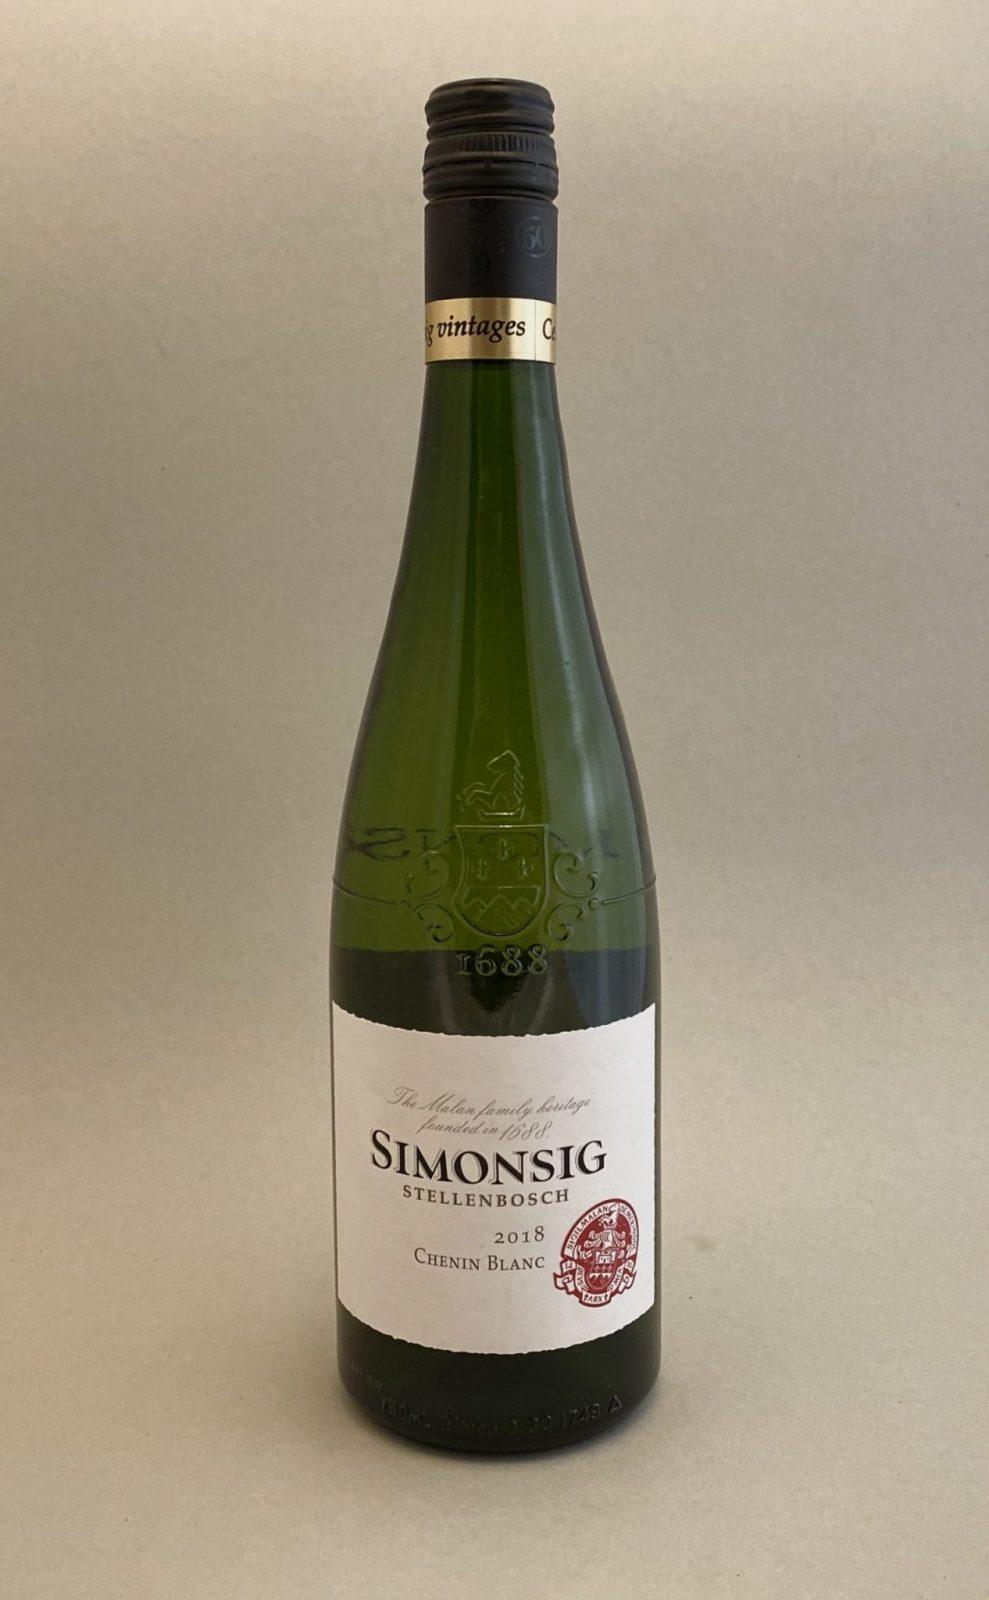 SIMONSIG Chenin Blanc 2018, vinoteka Sunny wines slnecnice mesto, Bratislava petrzalka, vino biele z Južnej Afriky